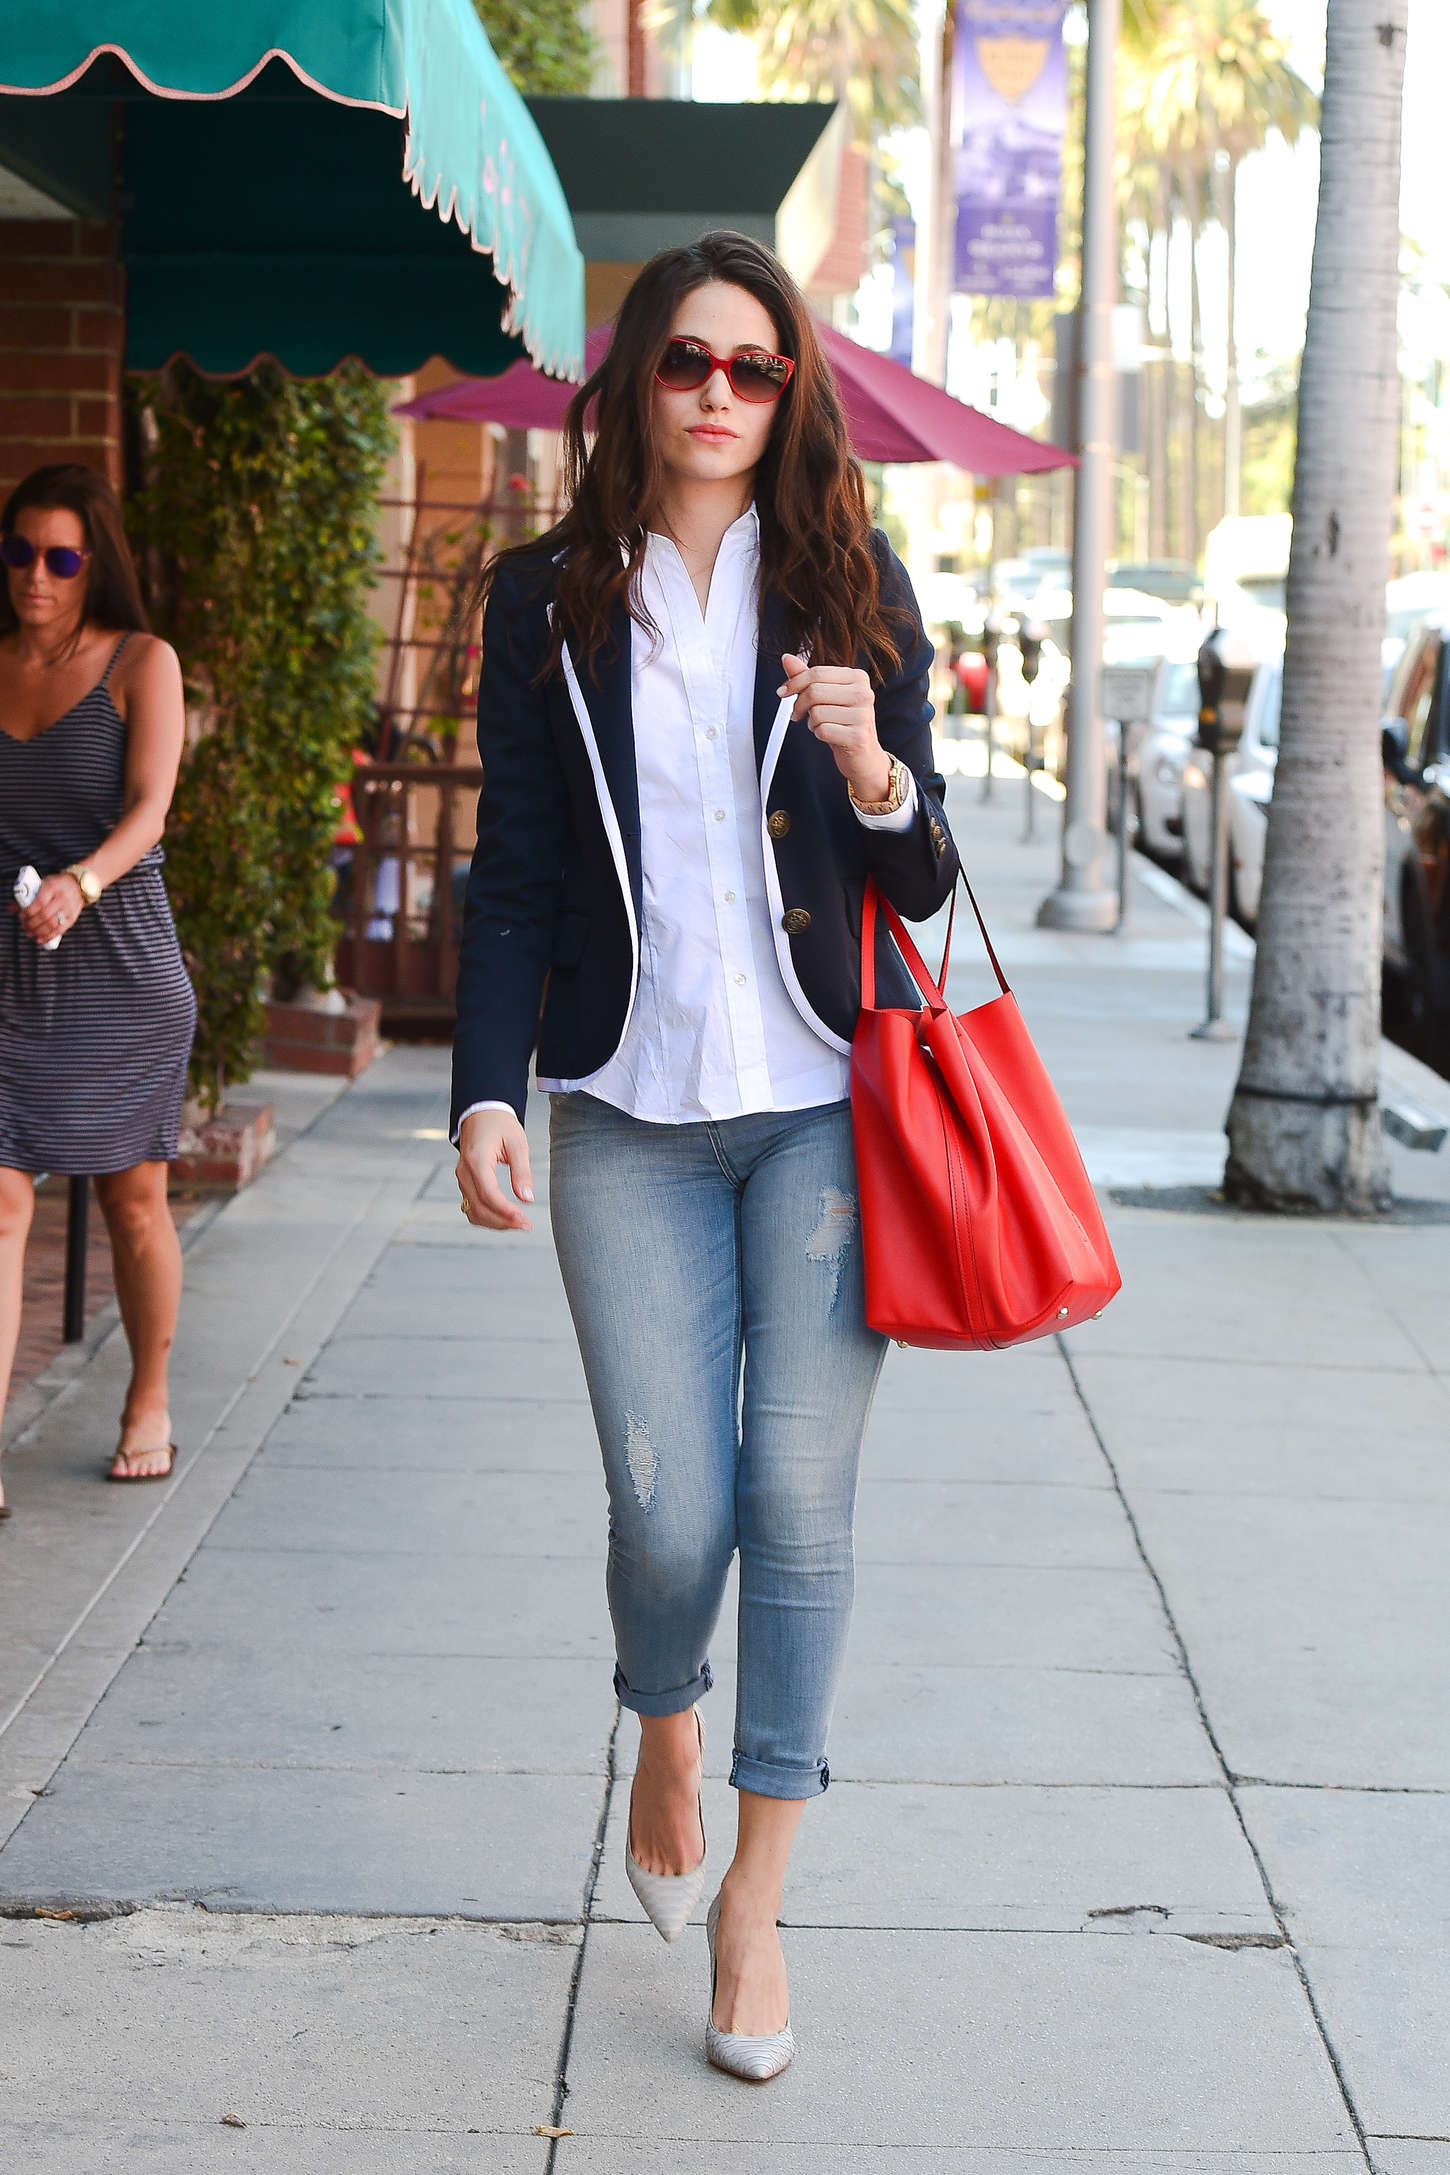 Emmy Rossum in Tight Jeans -27 - GotCeleb